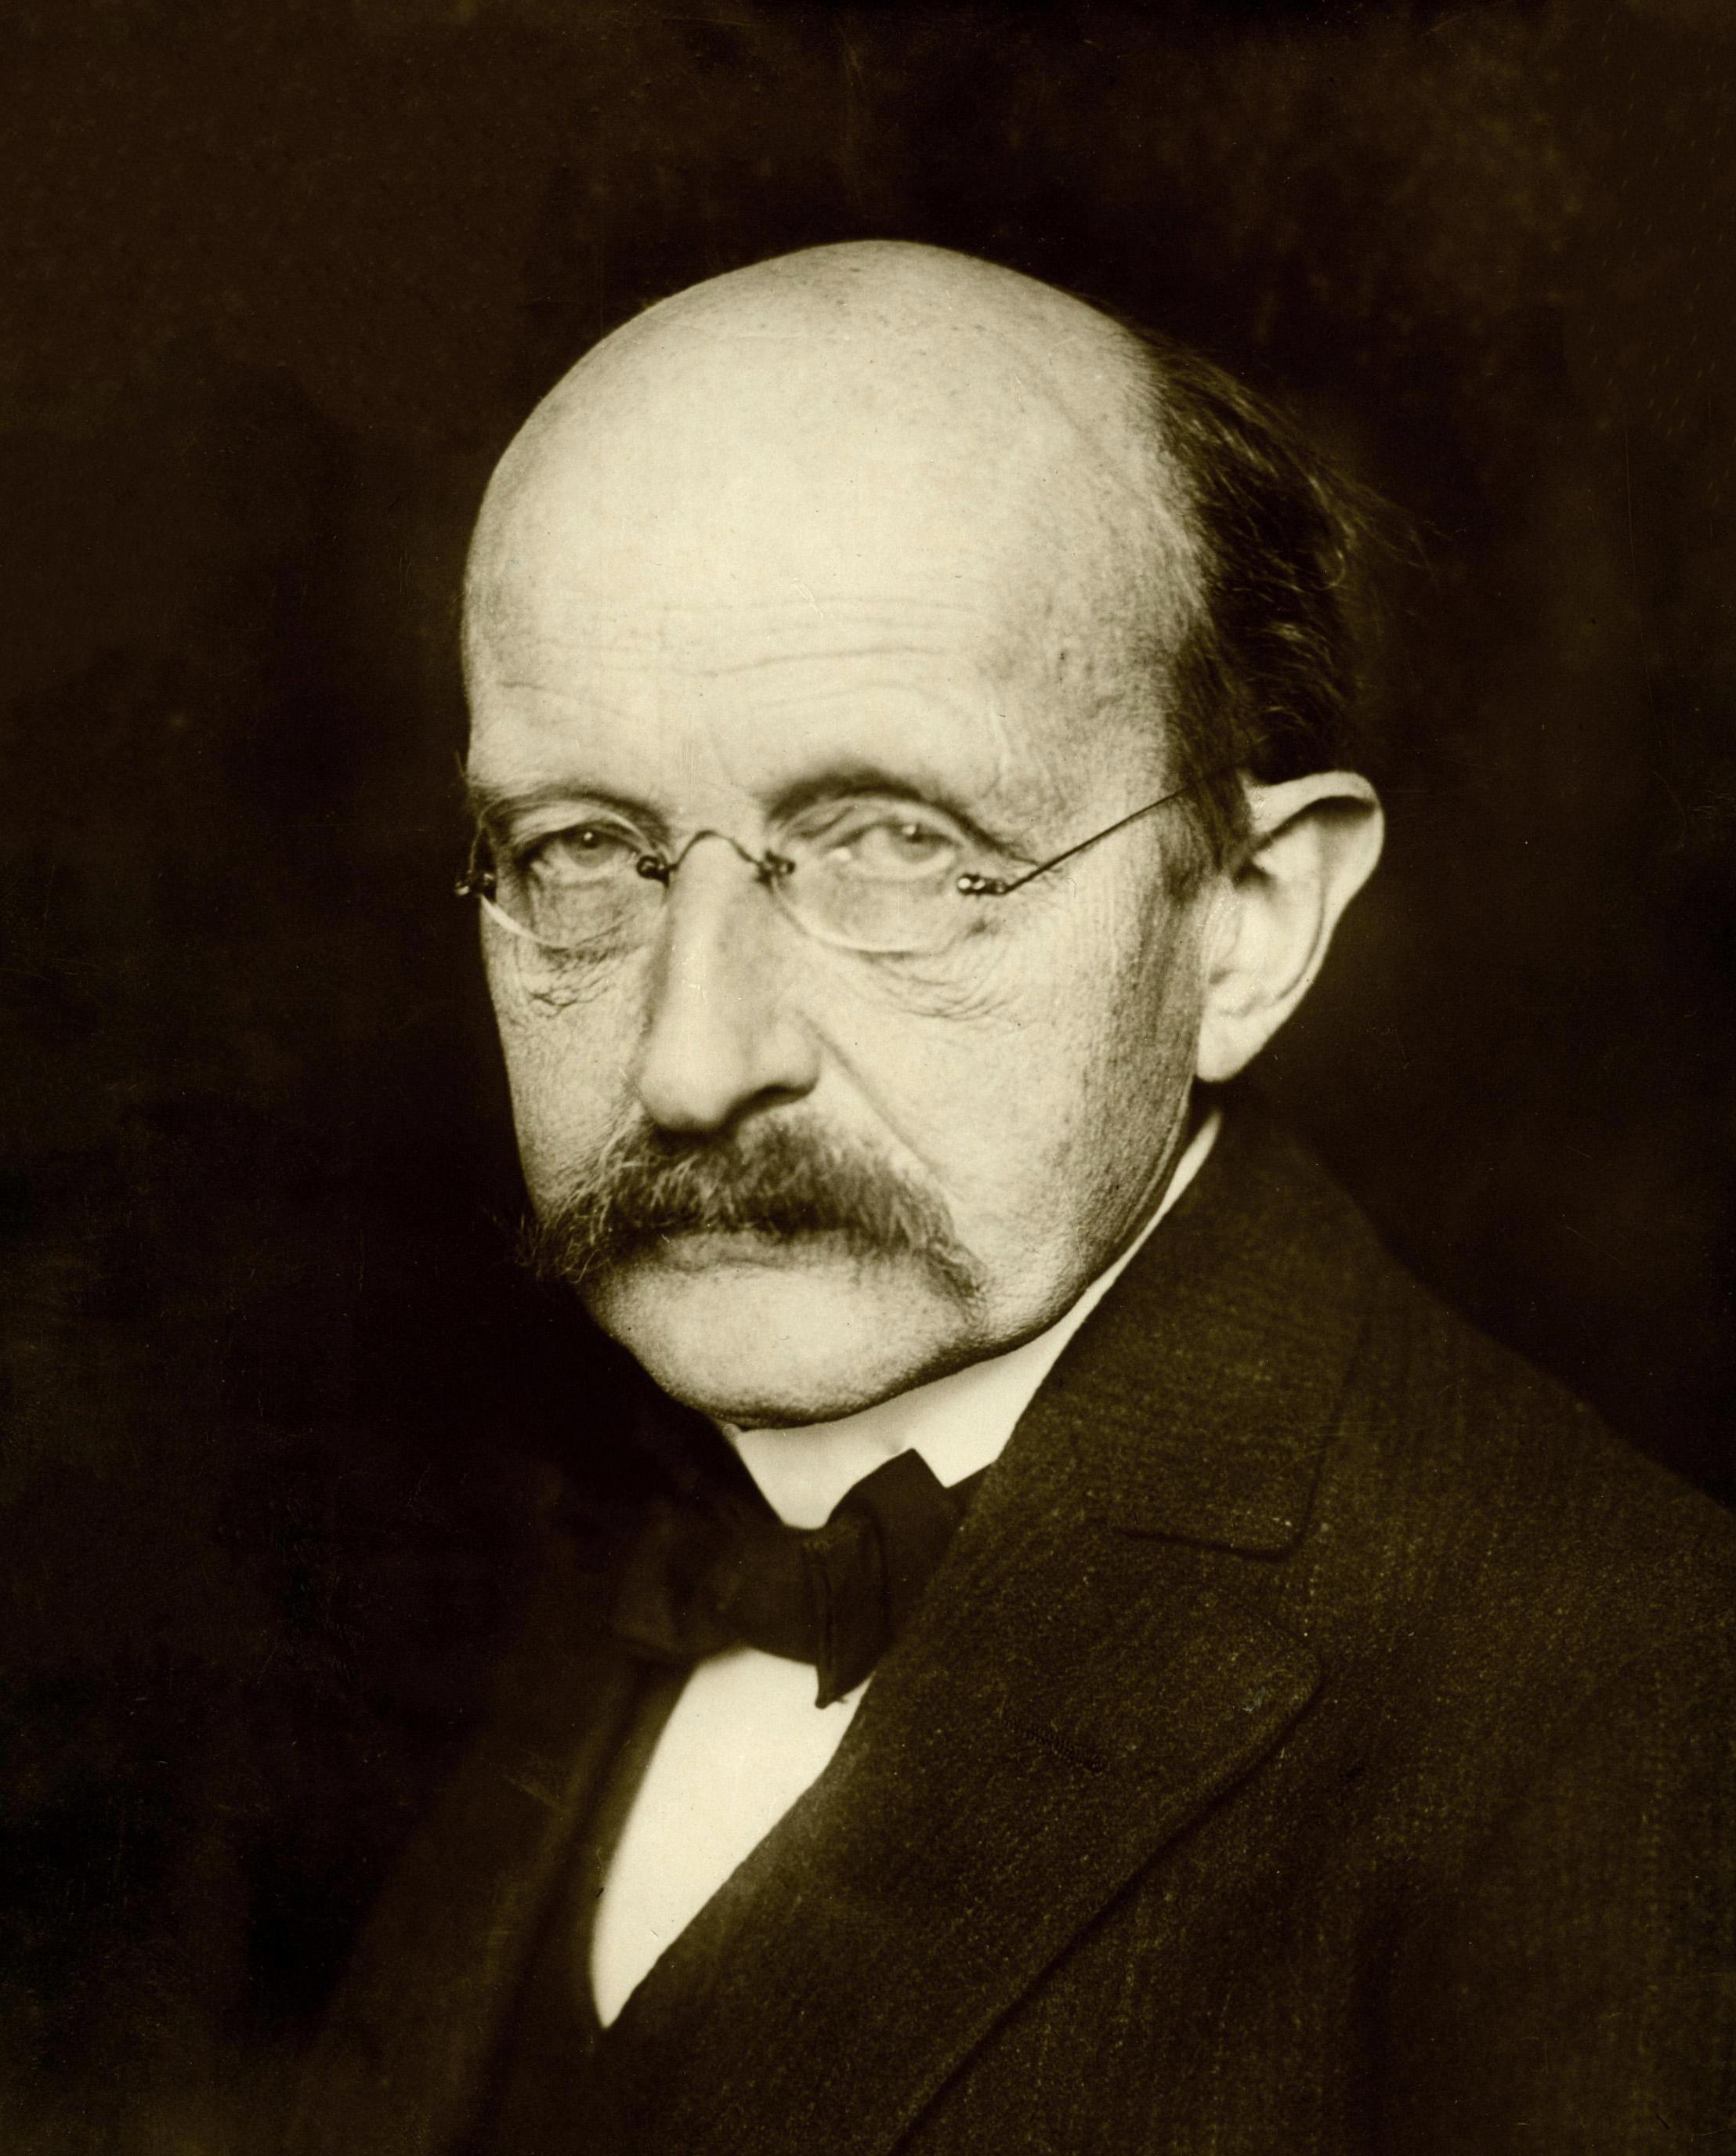 German physicist Max Planck  Max Planck Berlin, 11 January 1933.Photographer unknown